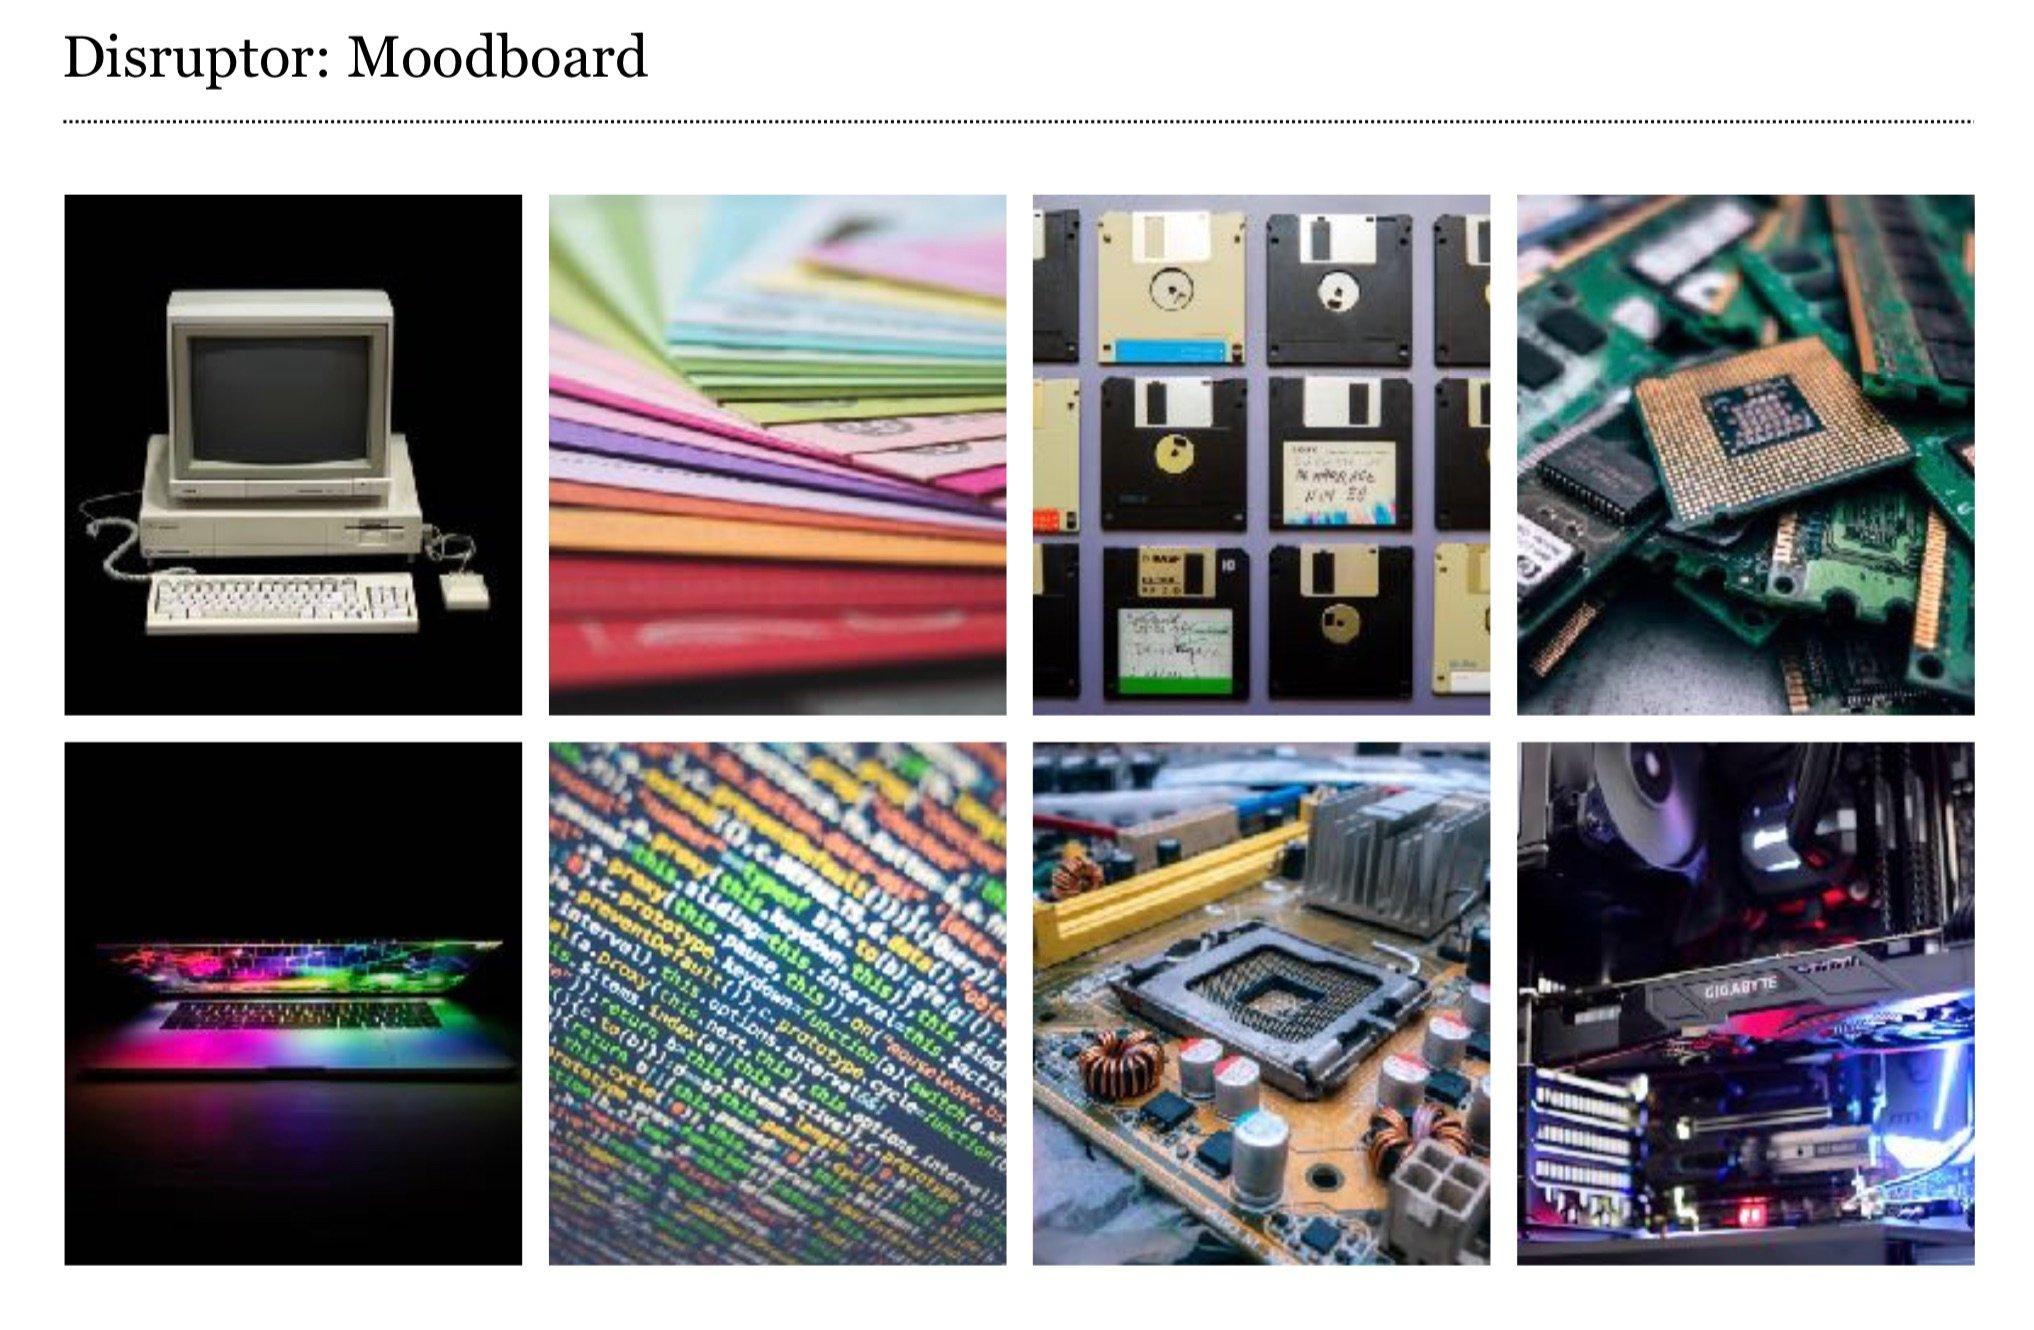 PwC IFRS17 Moodboard